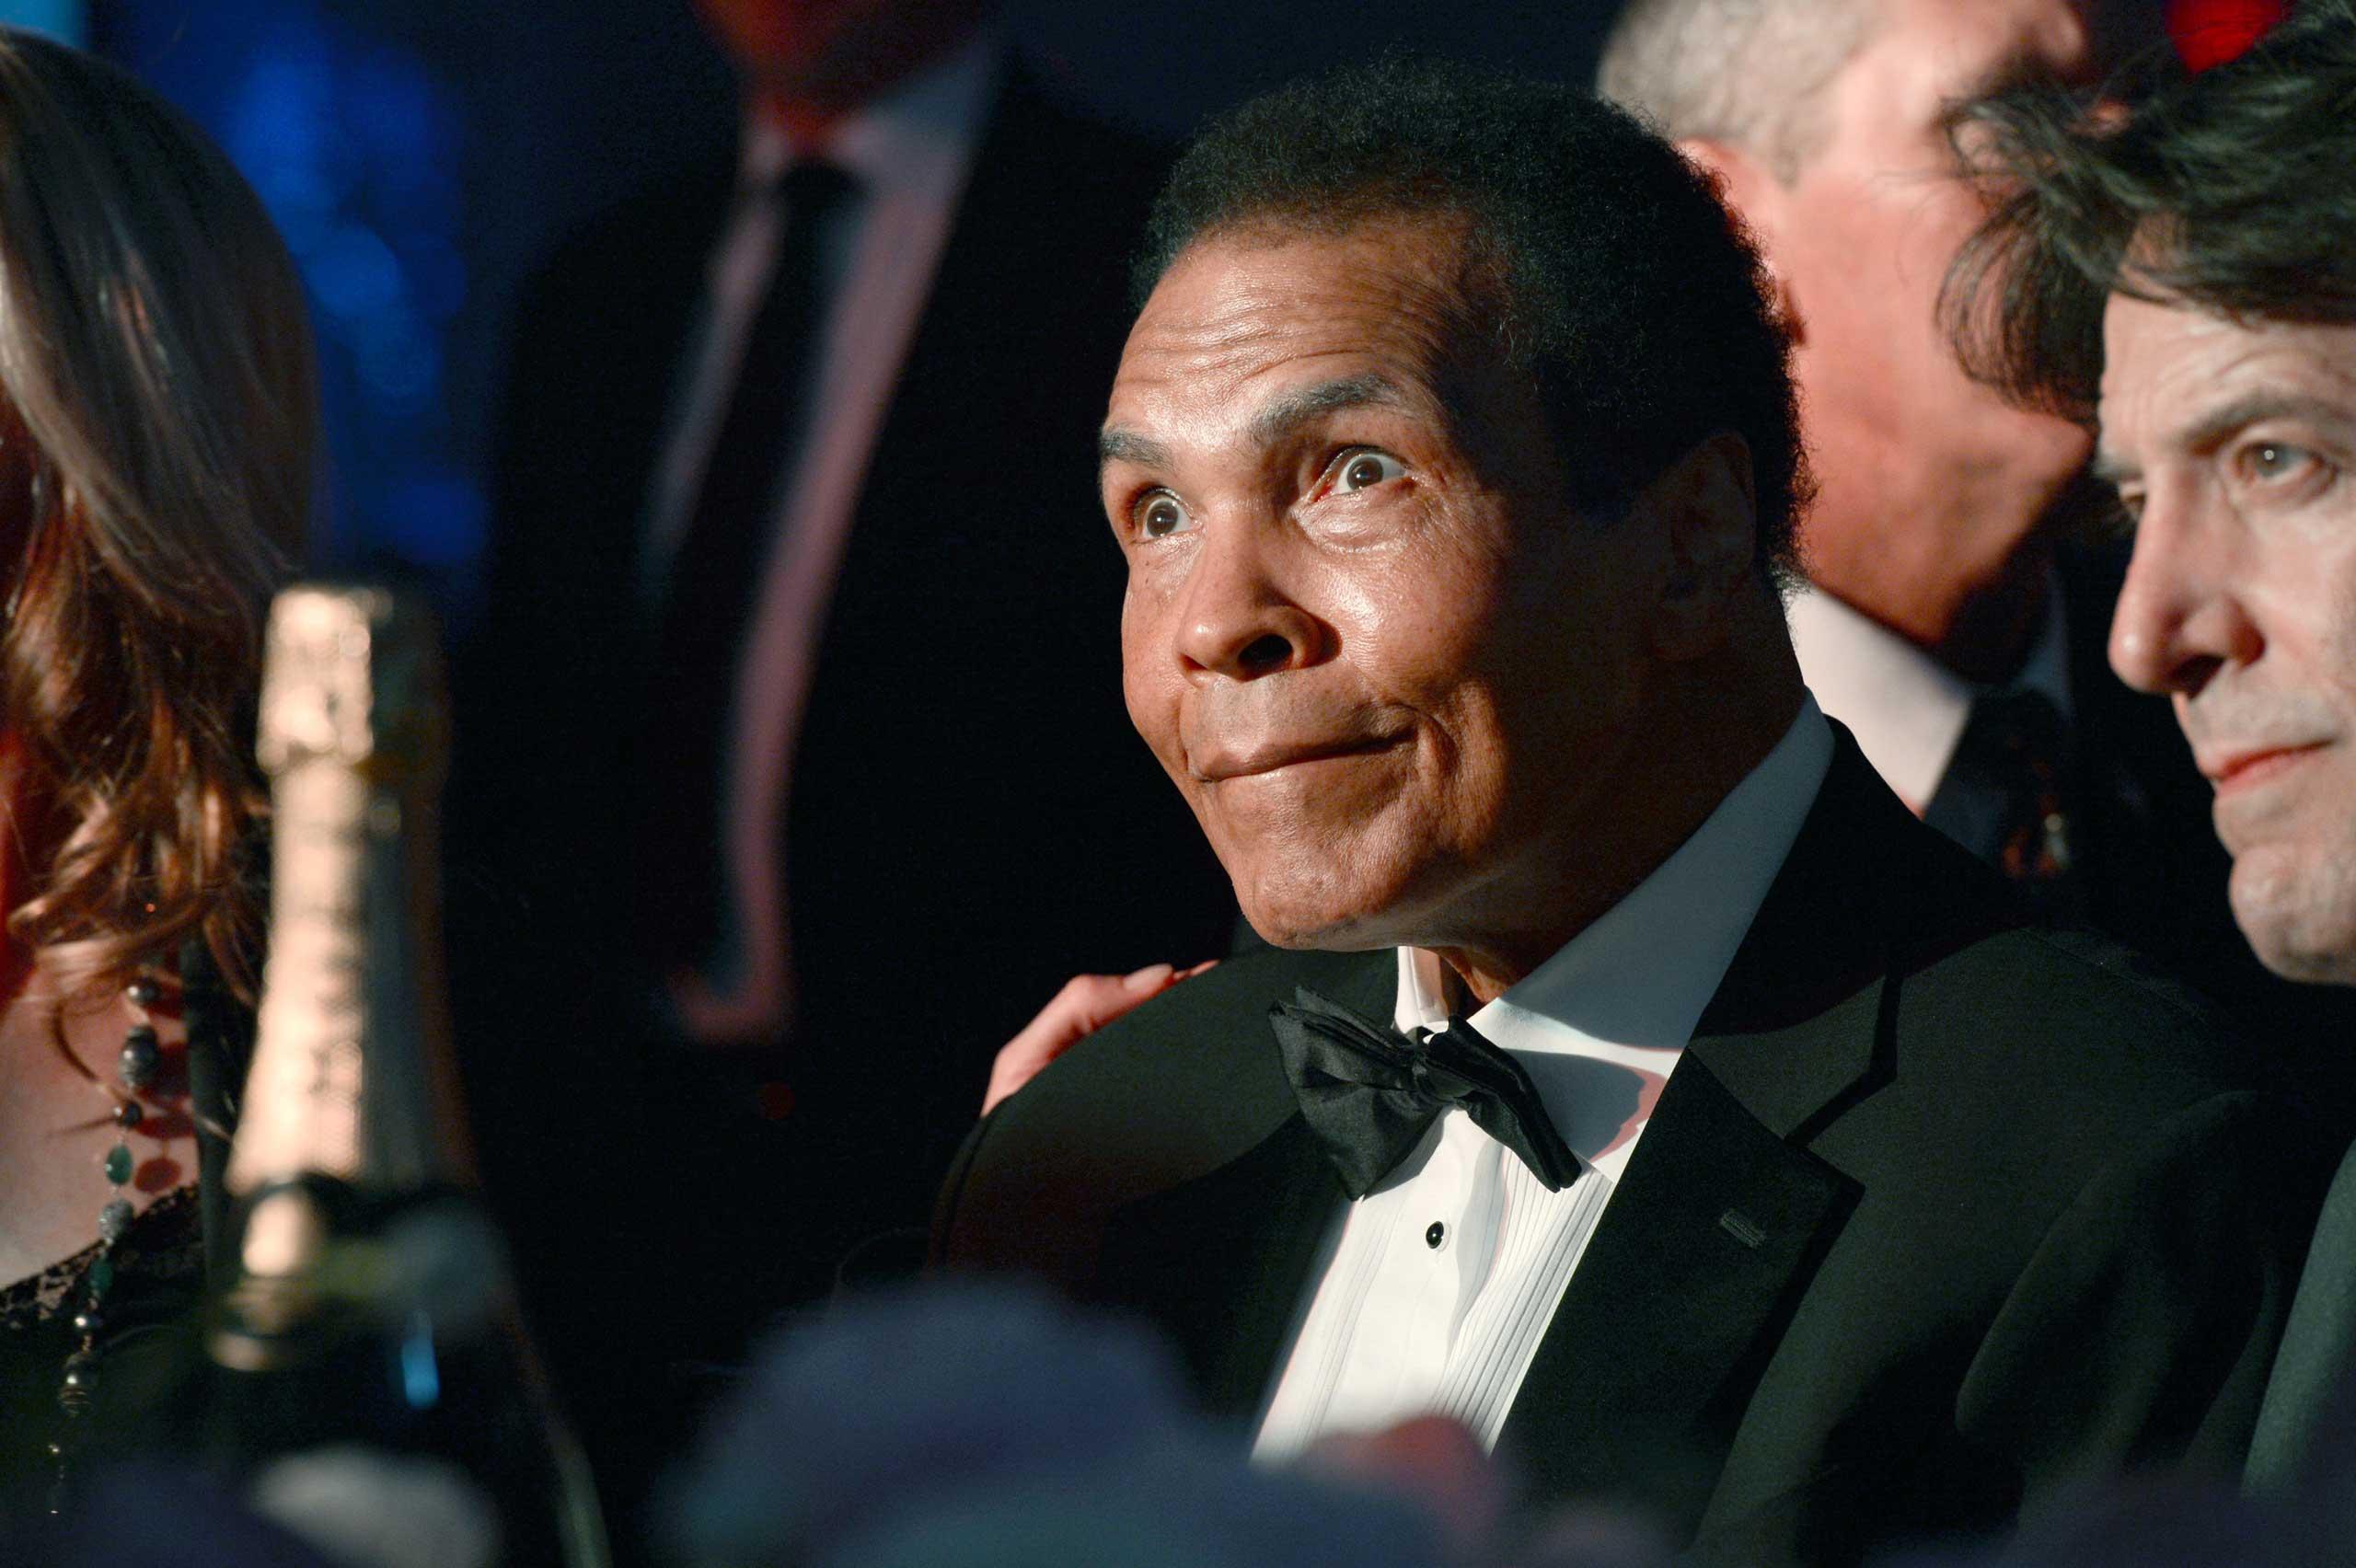 Muhammad Ali at Celebrity Fight Night XIX at JW Marriott Desert Ridge Resort & Spa in Phoenix on March 23, 2013.